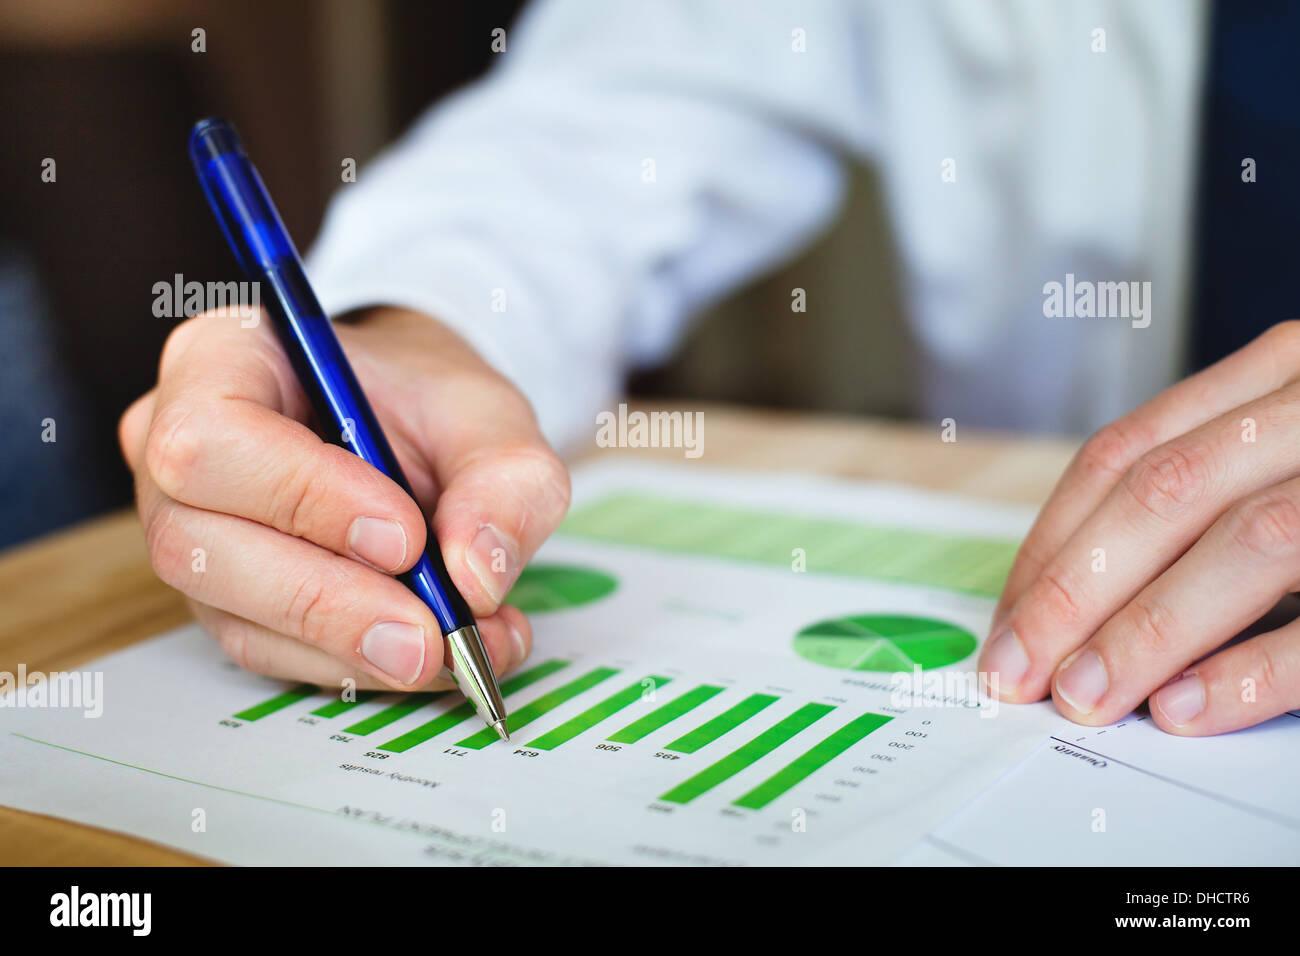 business analyze sustainable development opportunities - Stock Image